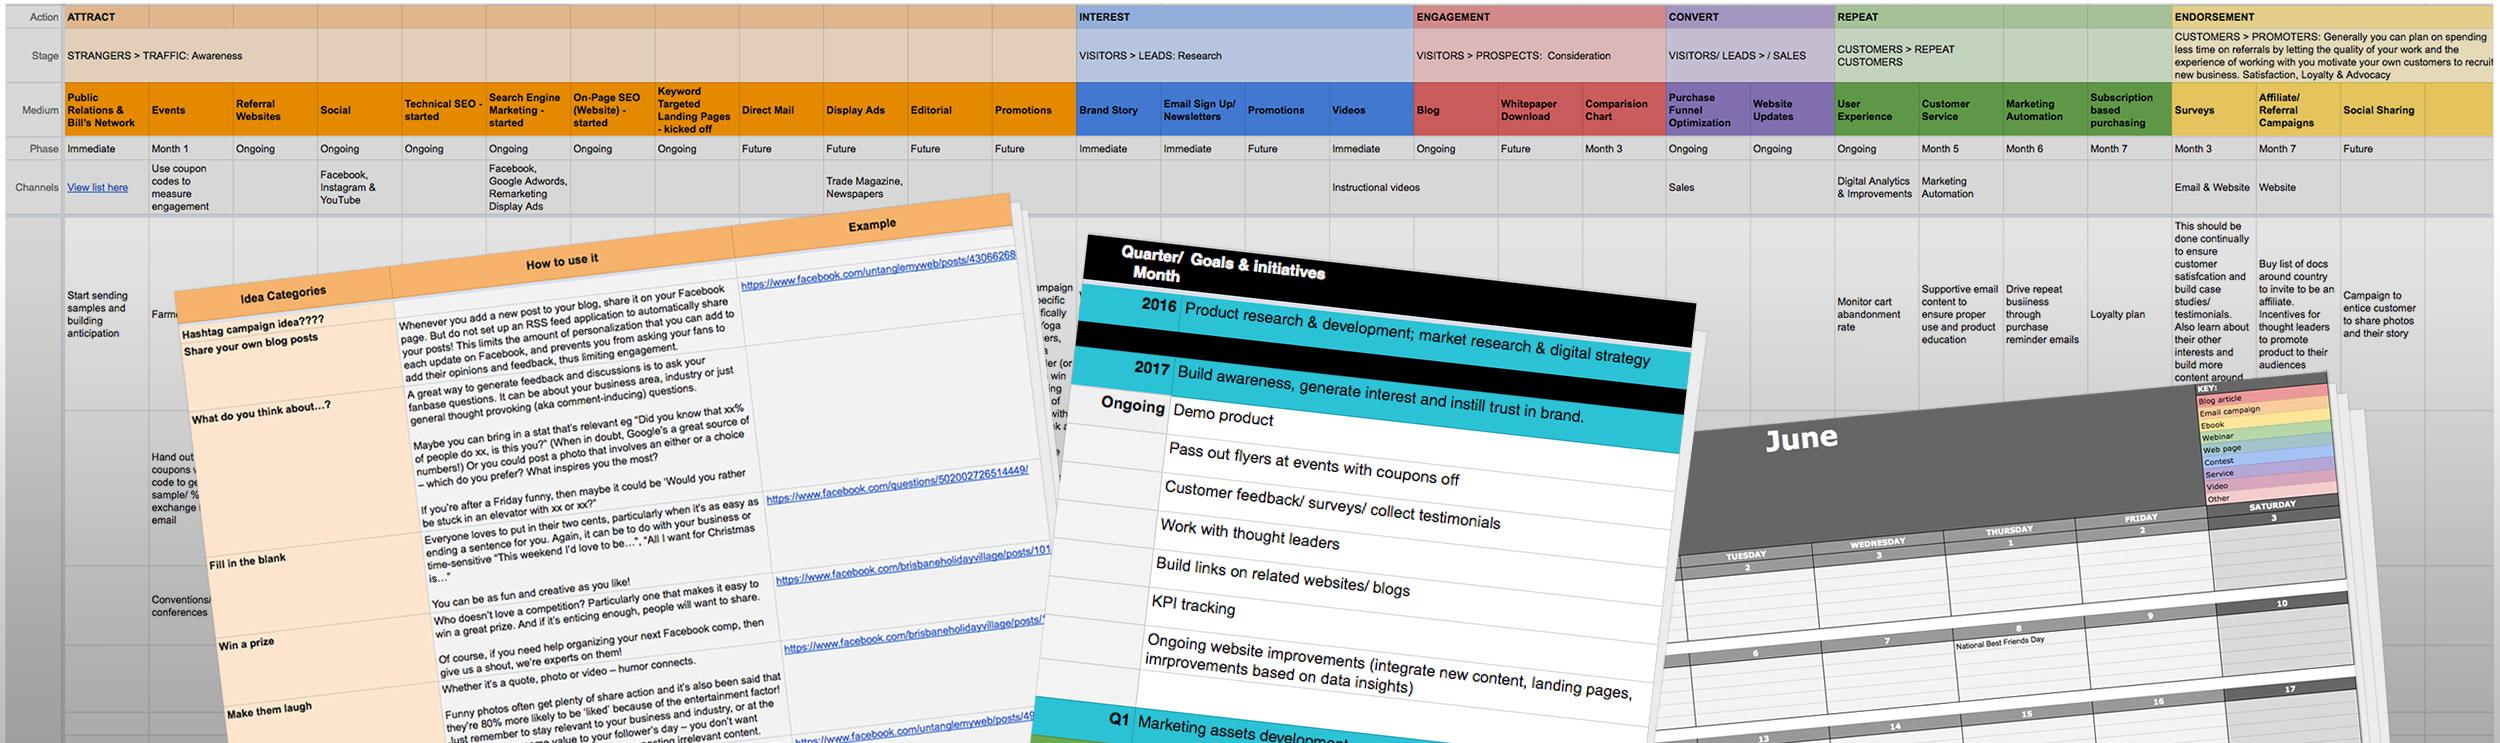 ecommerce-digital-marketing-plan